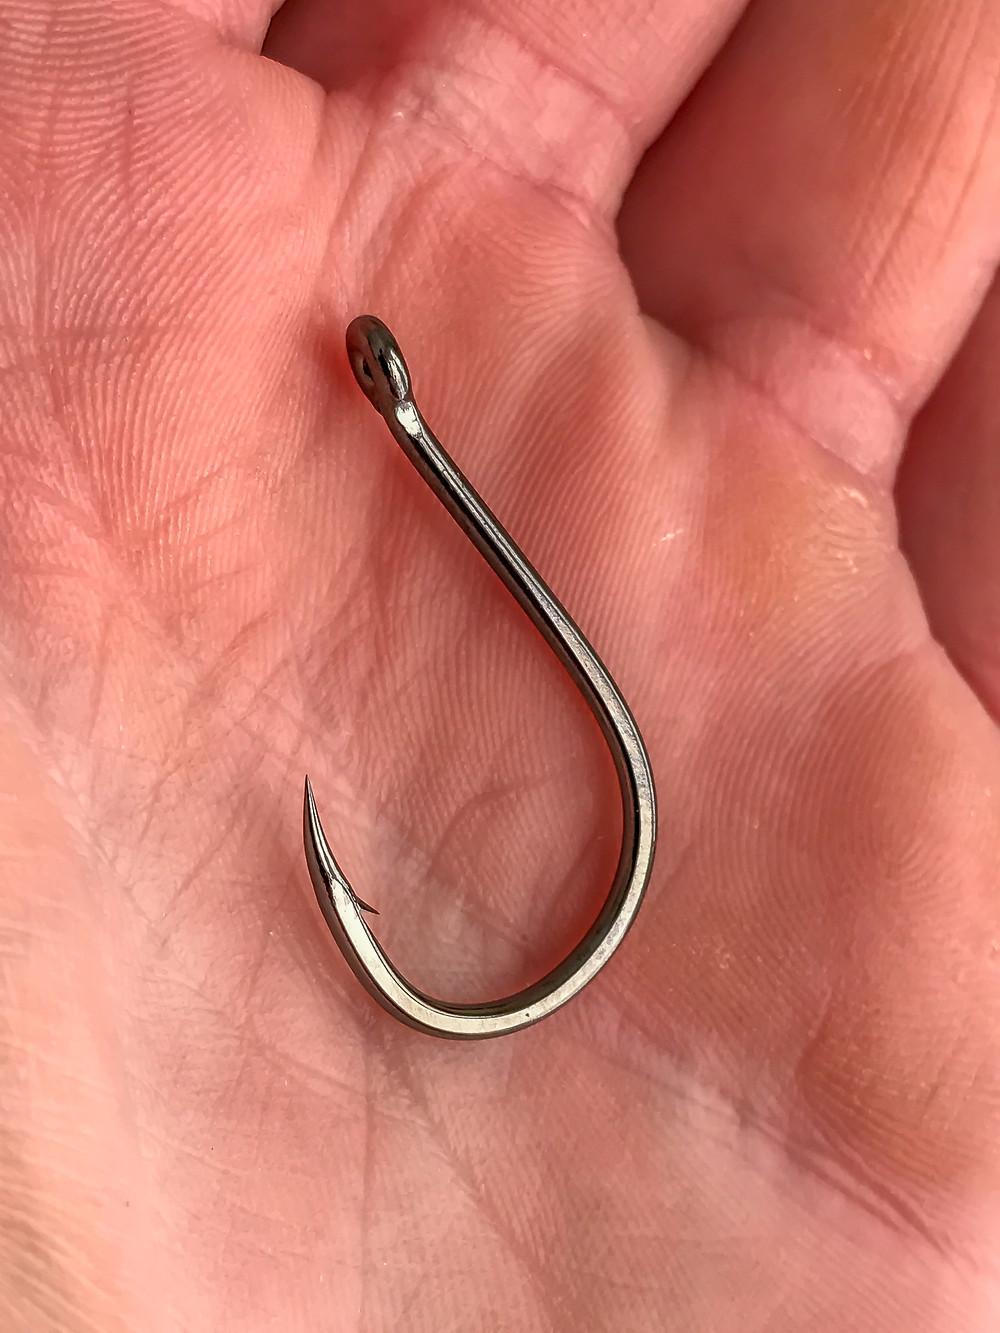 The Chinu, a hook that sticks